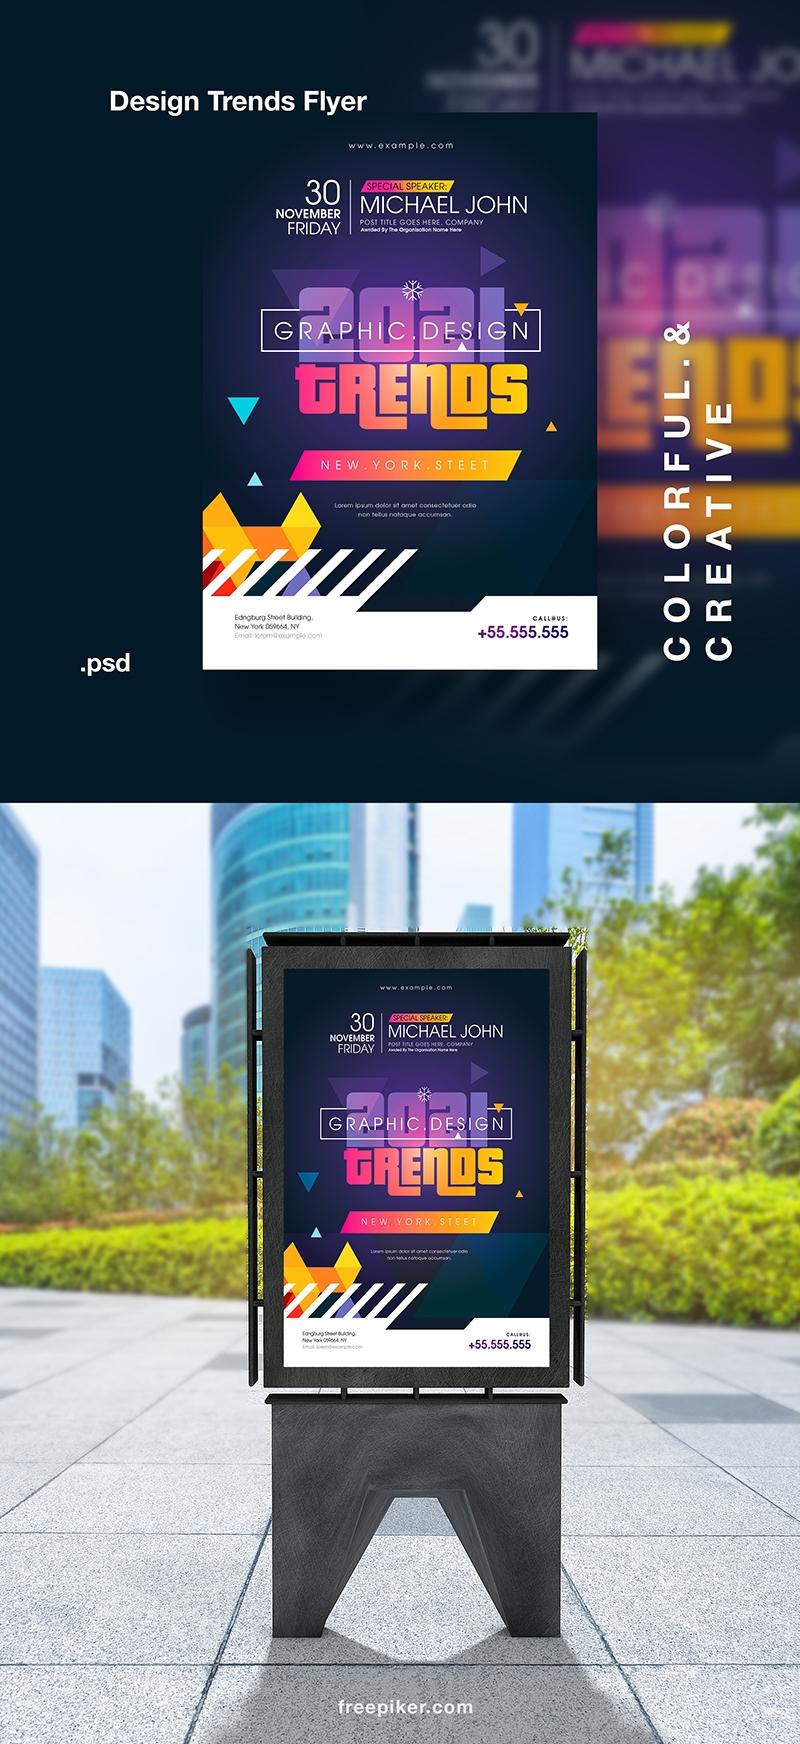 Creative Design Trends Event Flyer / Poster